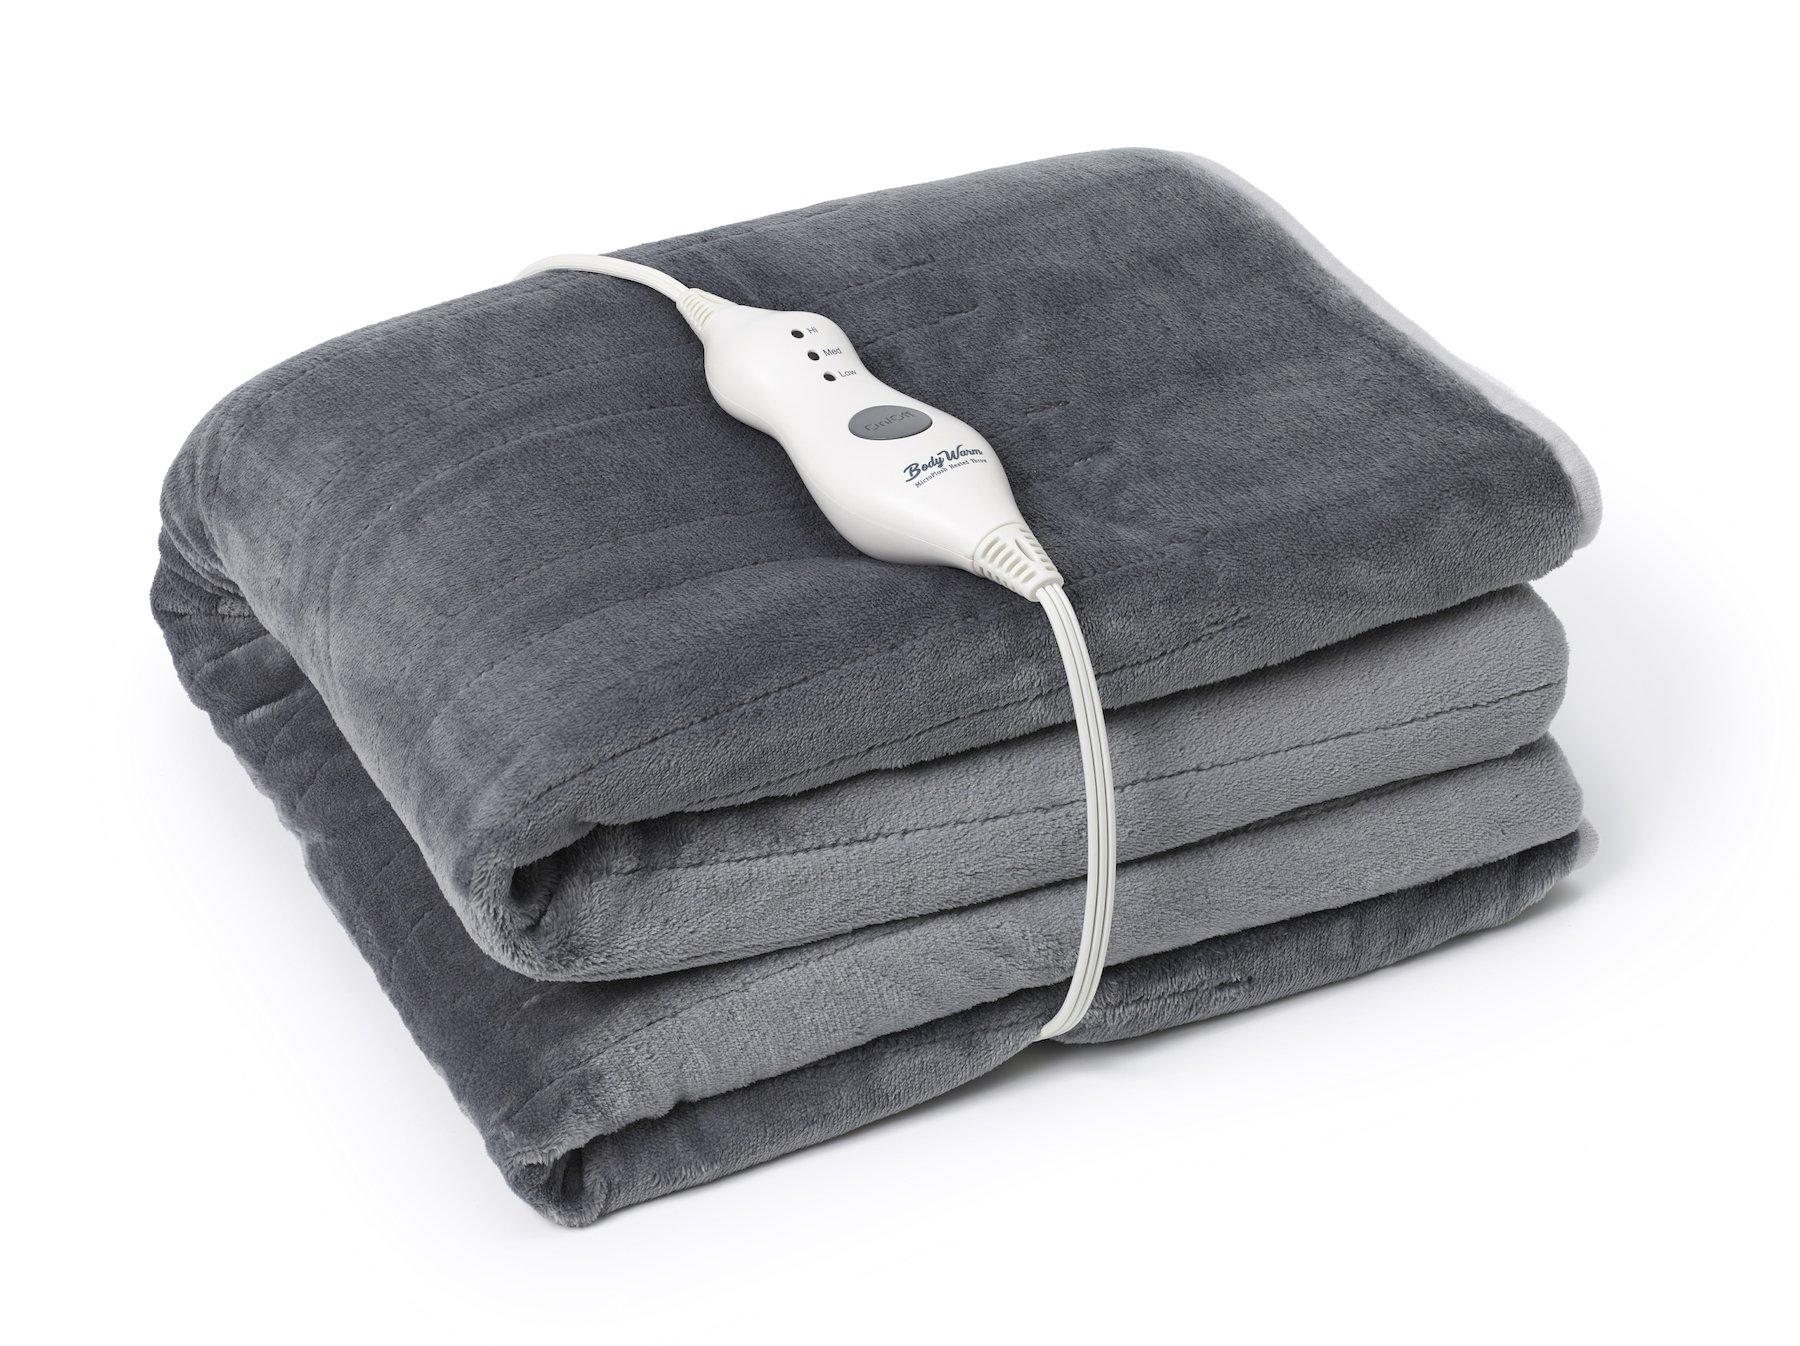 Thaynards BodyWarm MicroPlush Heated Throw – Warm Grey, Auto-Off, Anti-Pilling, Machine Washable